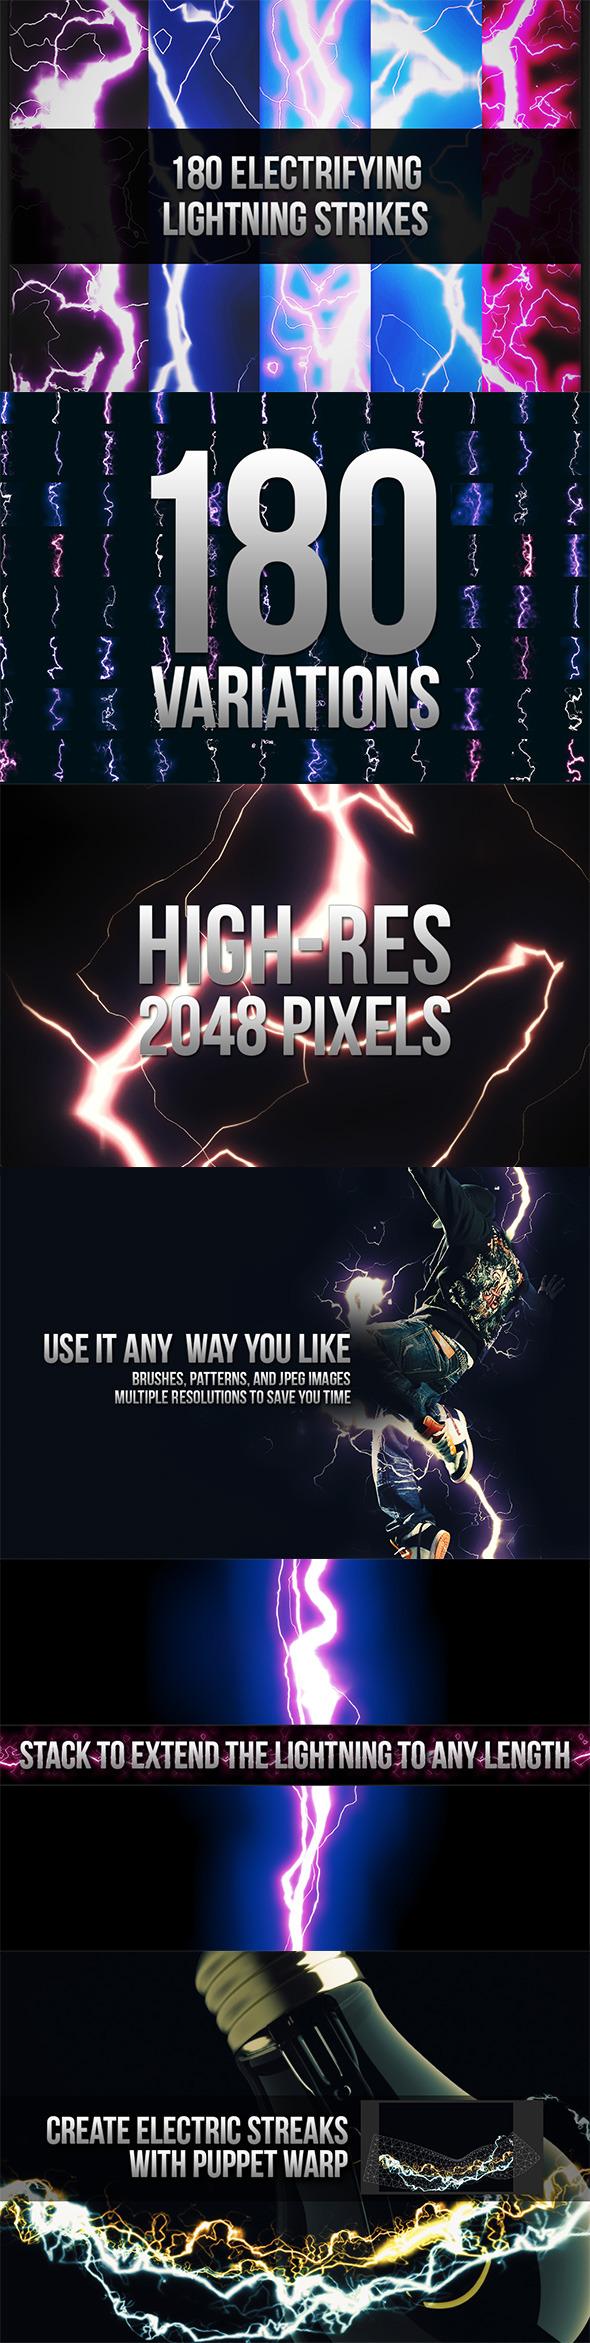 180 Seamless Lightning Strikes - Techno / Futuristic Textures / Fills / Patterns